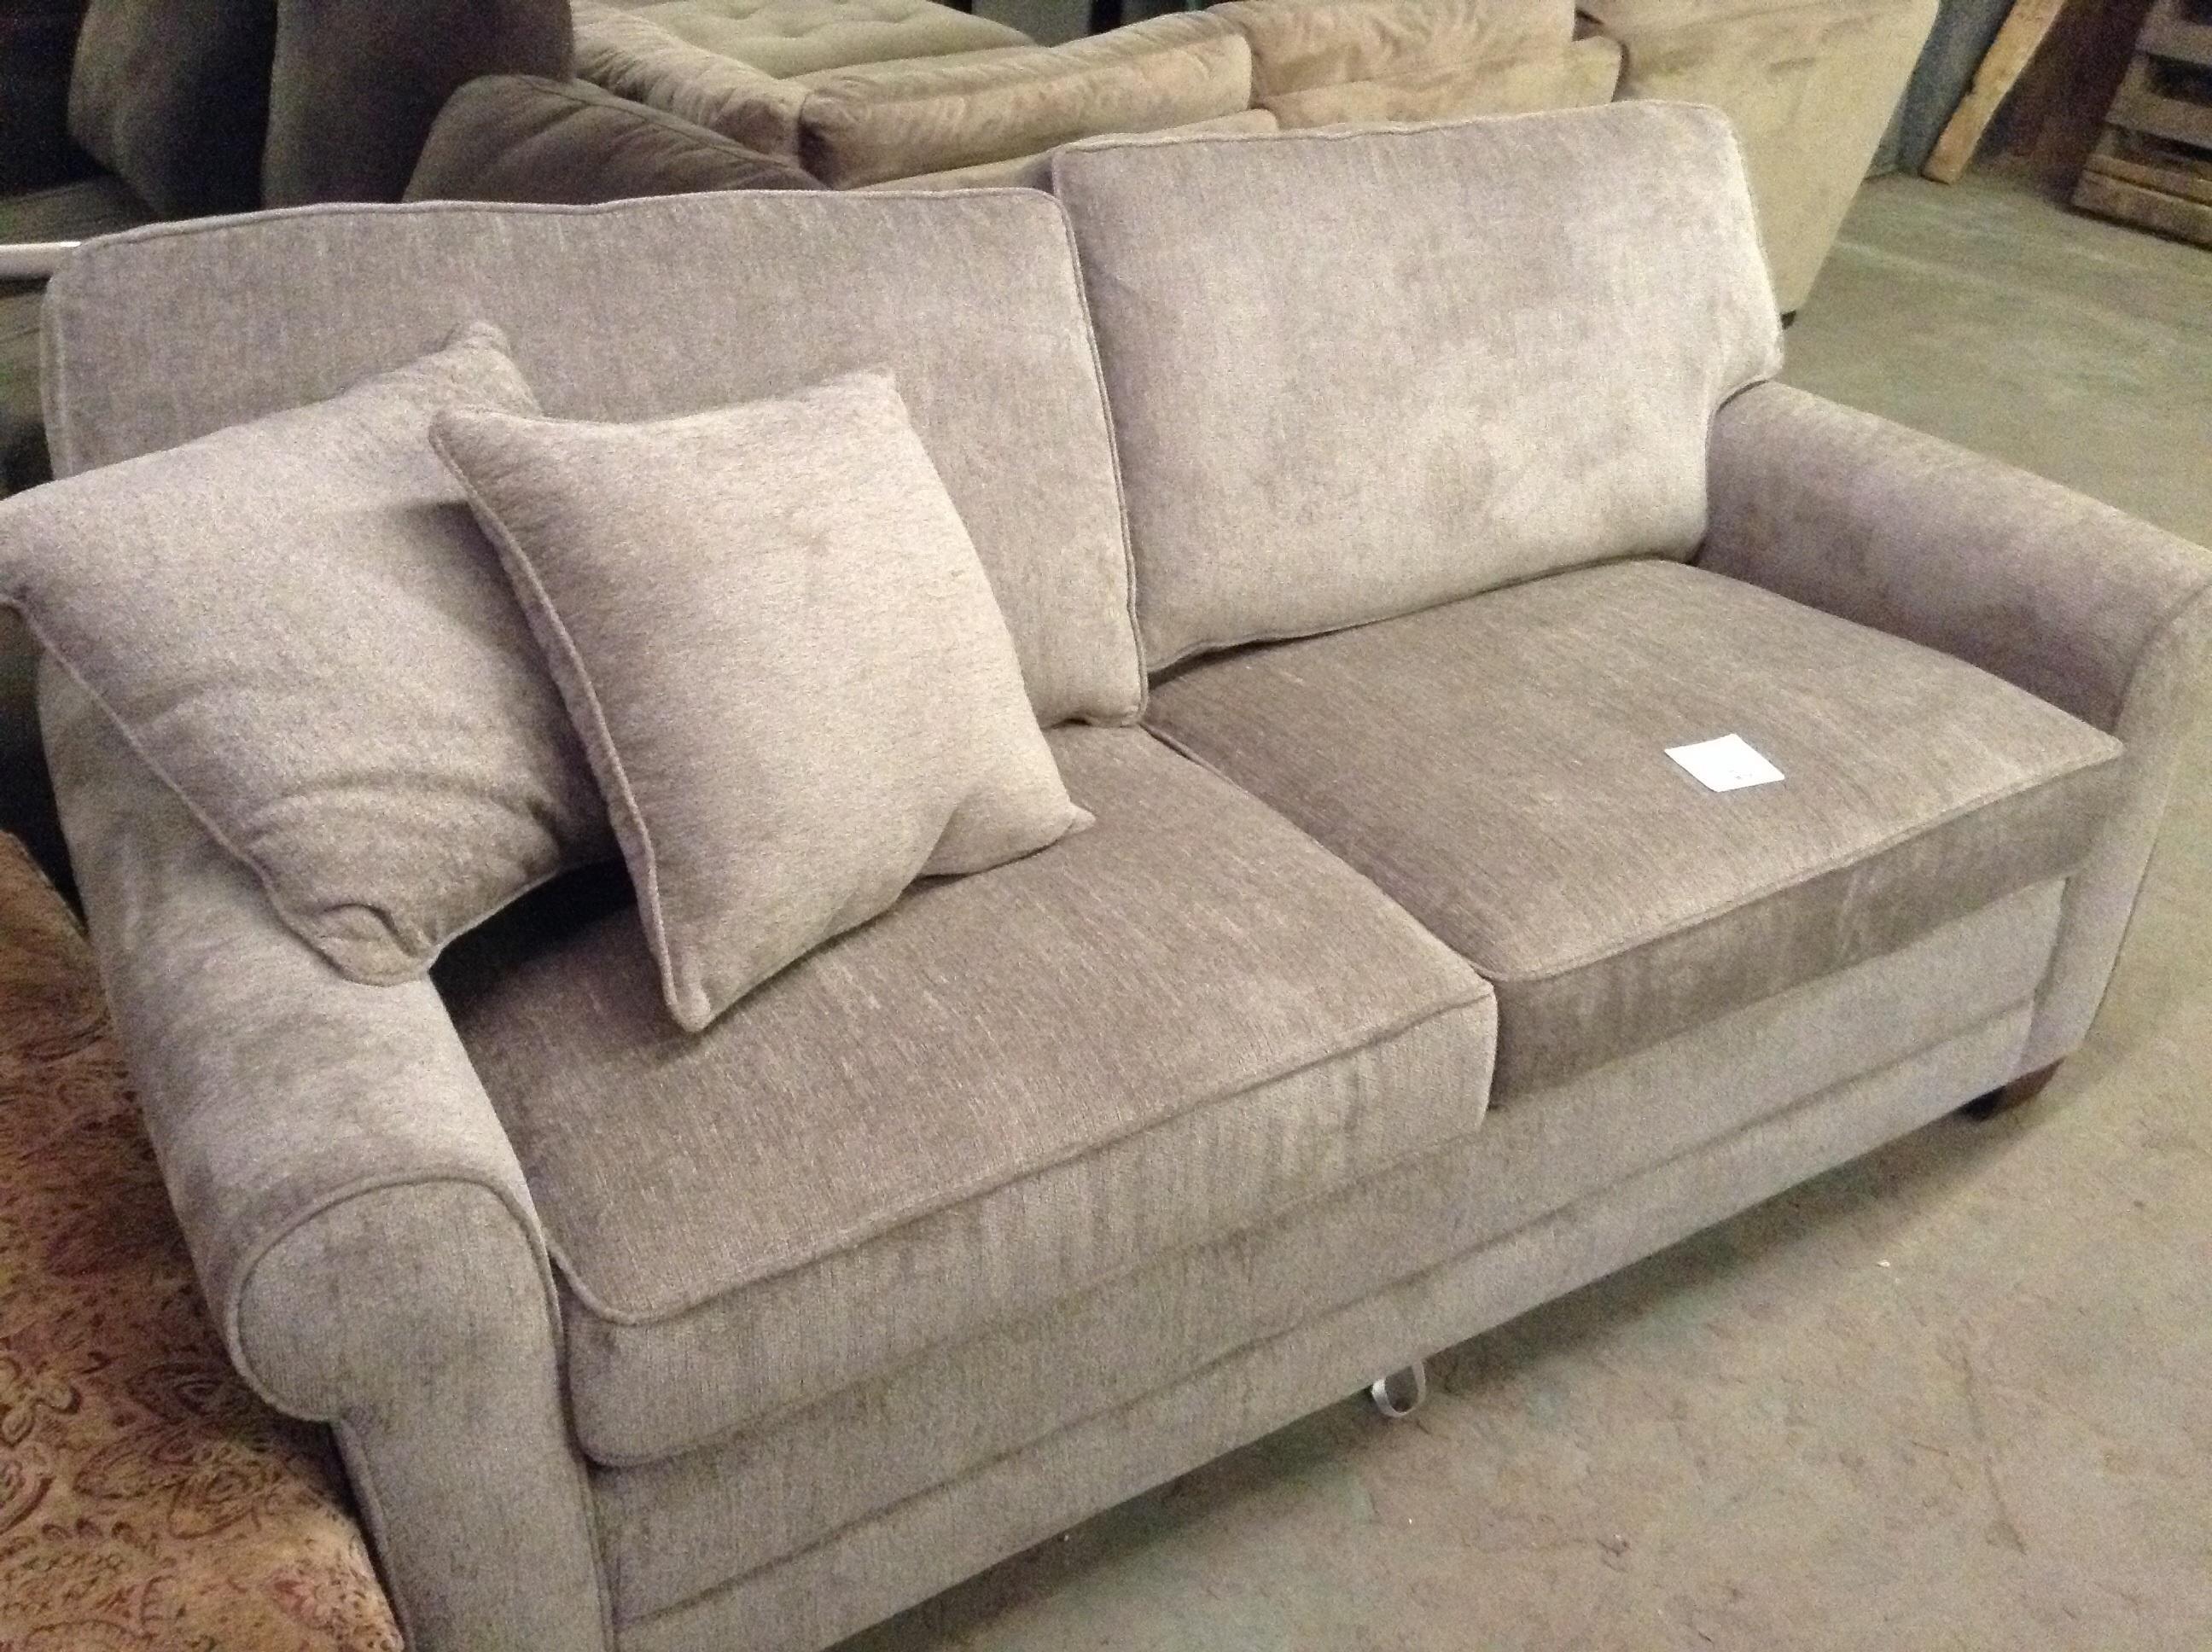 Chenille Sleeper Sofa With Design Hd Photos 37779 | Kengire Regarding Chenille Sleeper Sofas (View 3 of 20)